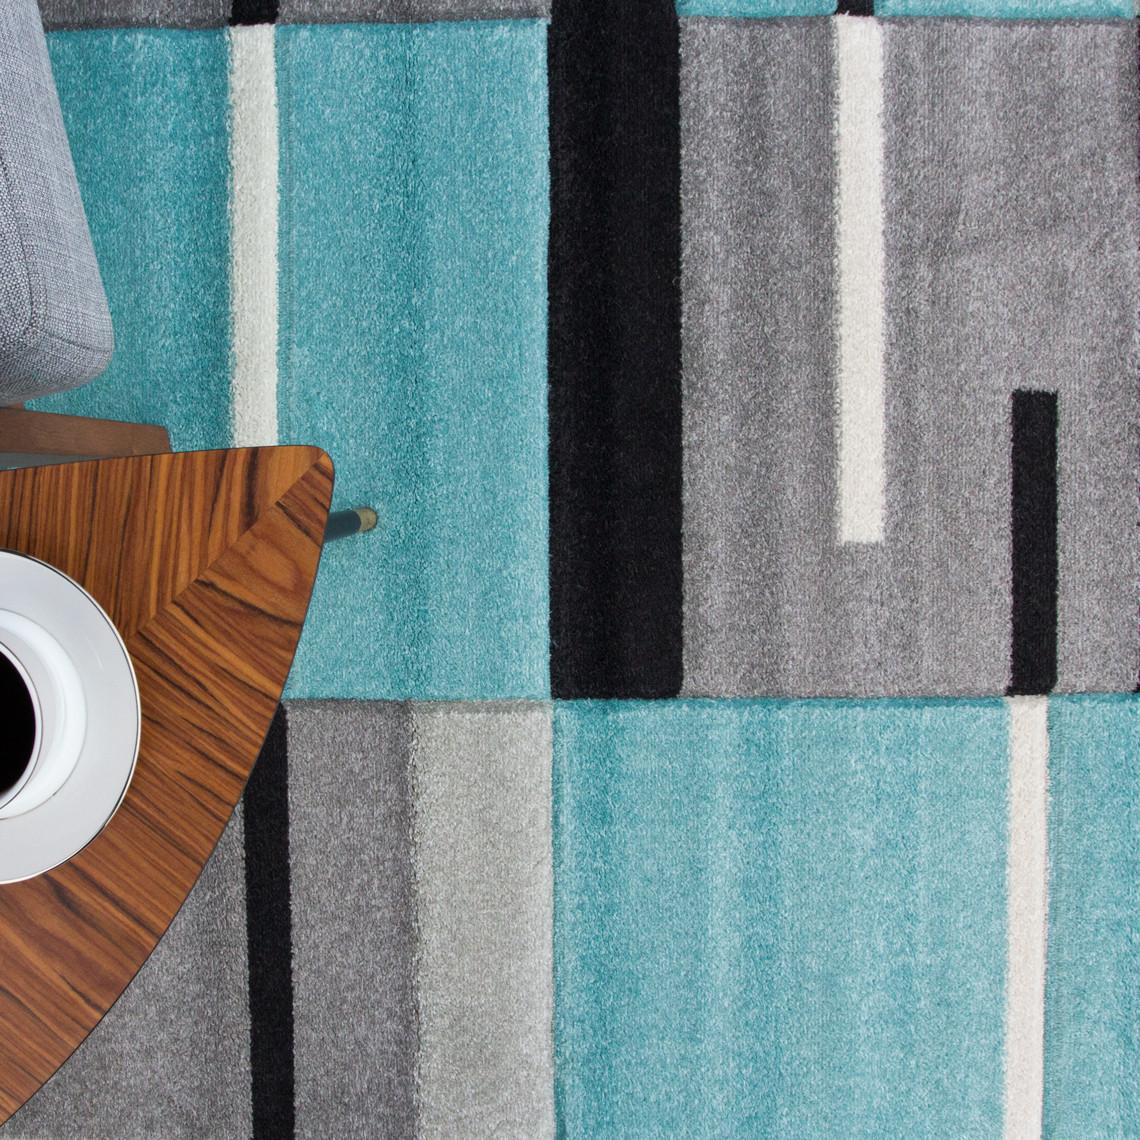 Rugs - Rio Range - Teal Blue & Grey Patchwork Living Room ...